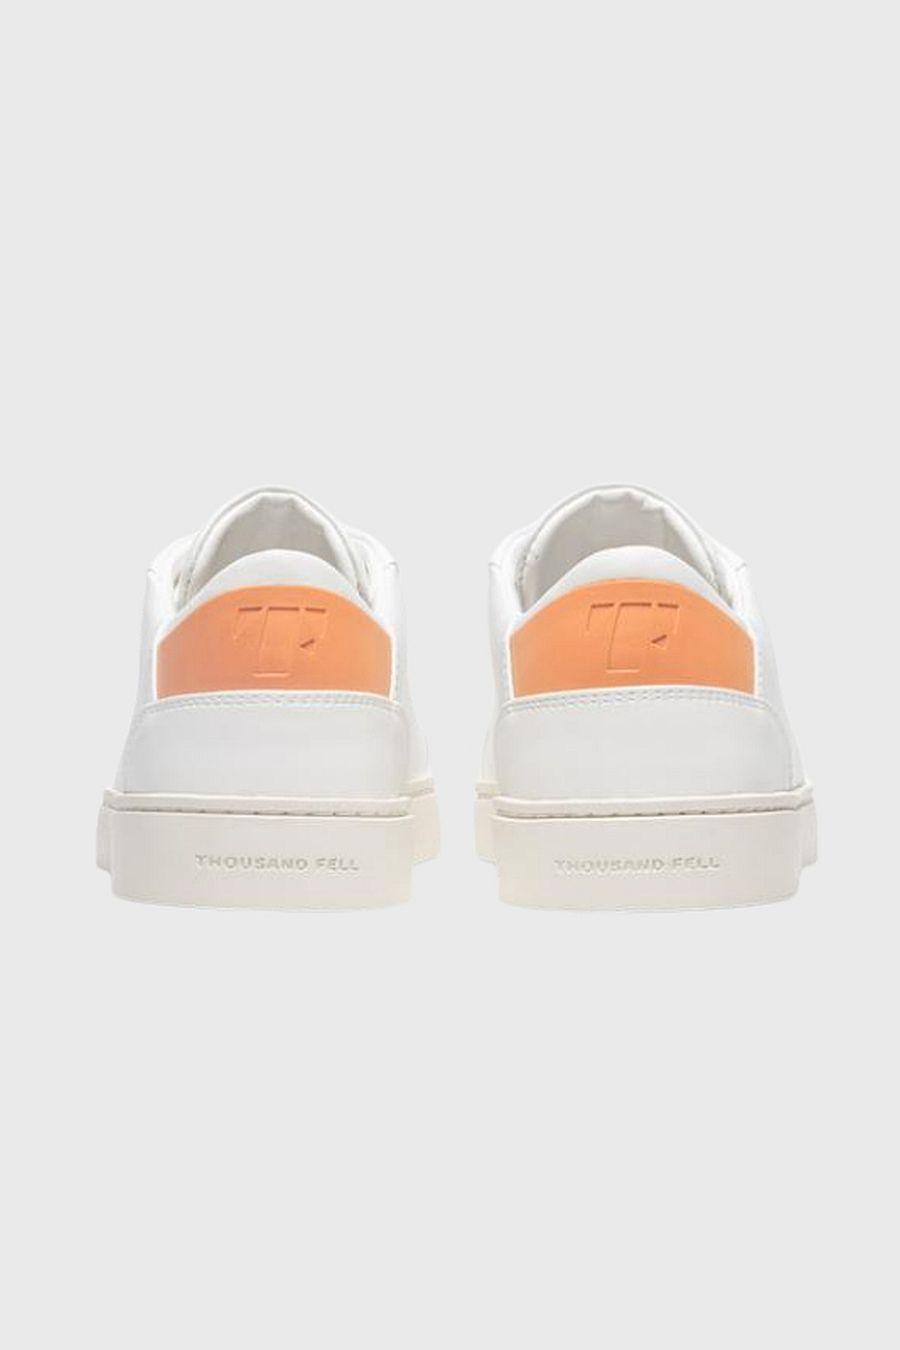 Thousand Fell Women's Lace Up   Crush (Orange)